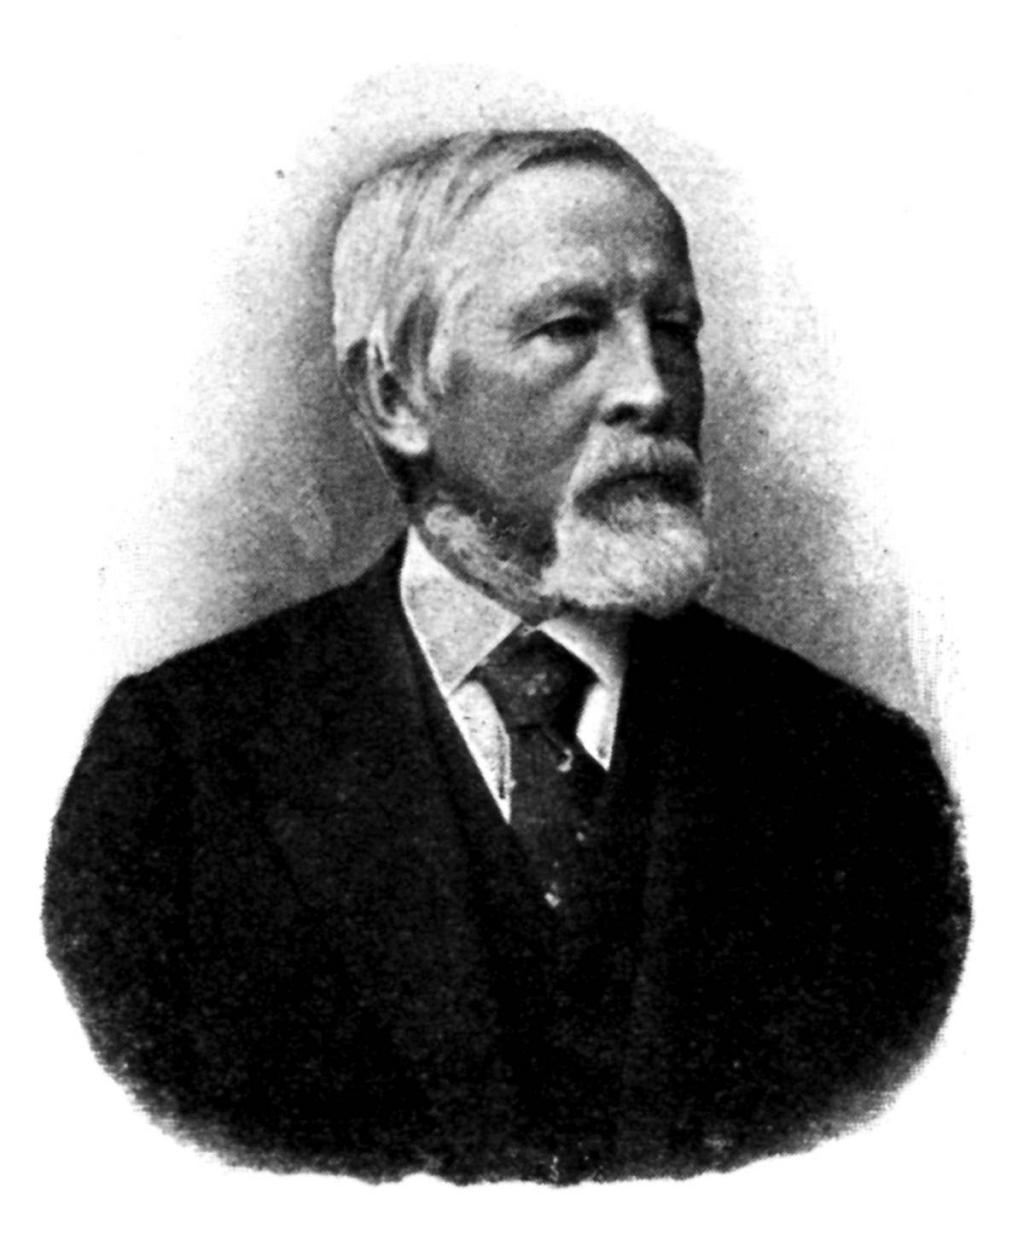 Adolph Kussmaul